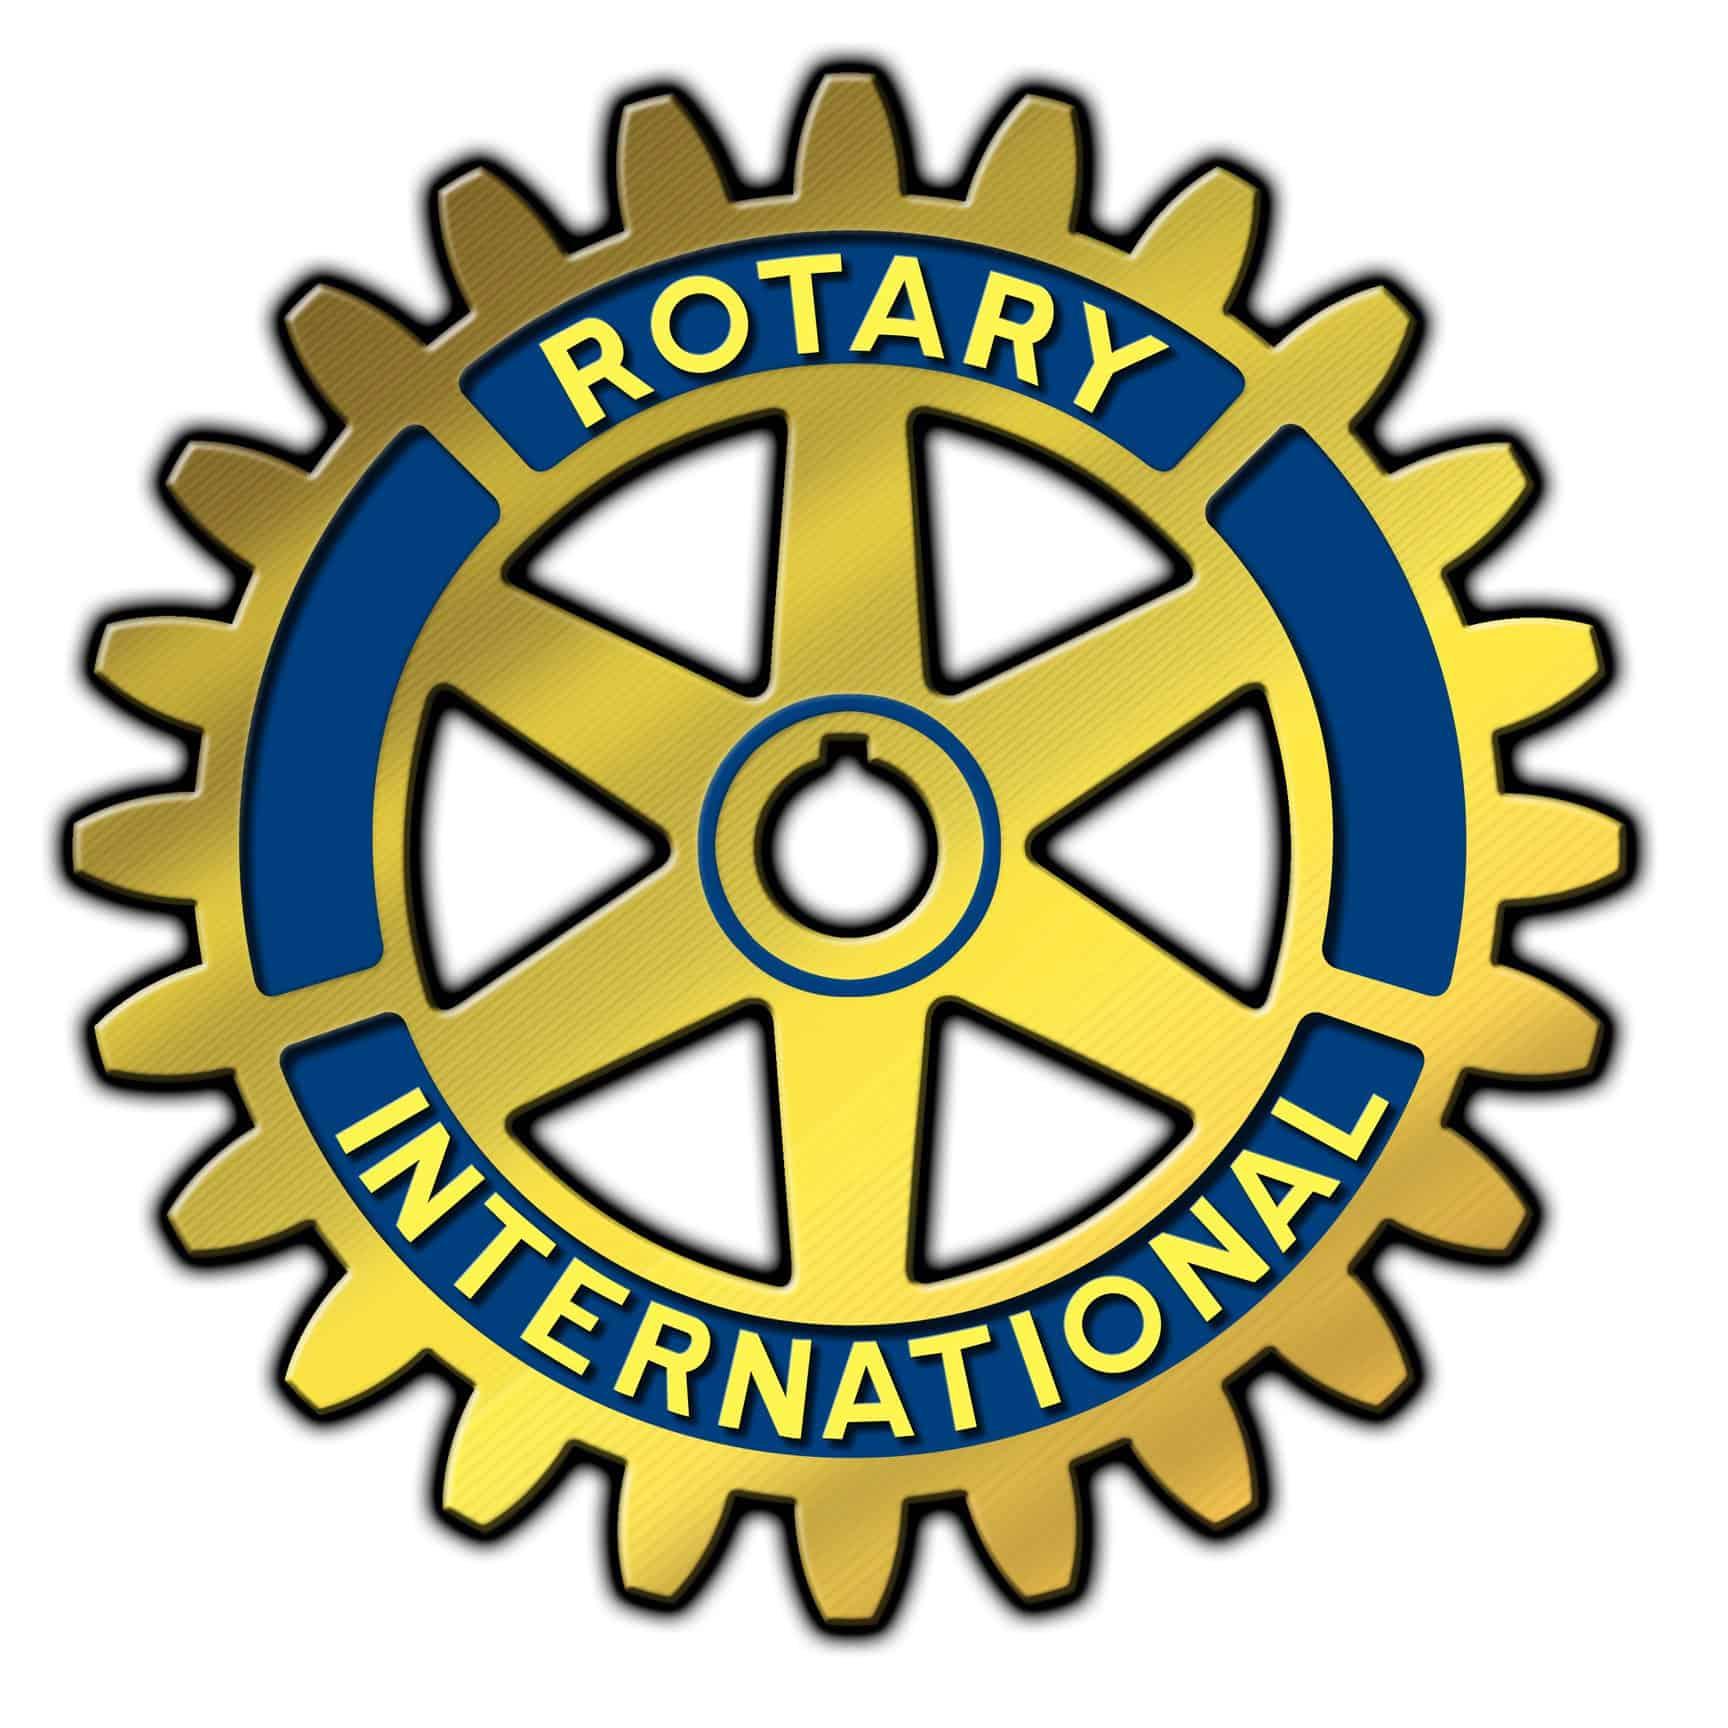 Spencer Rotary